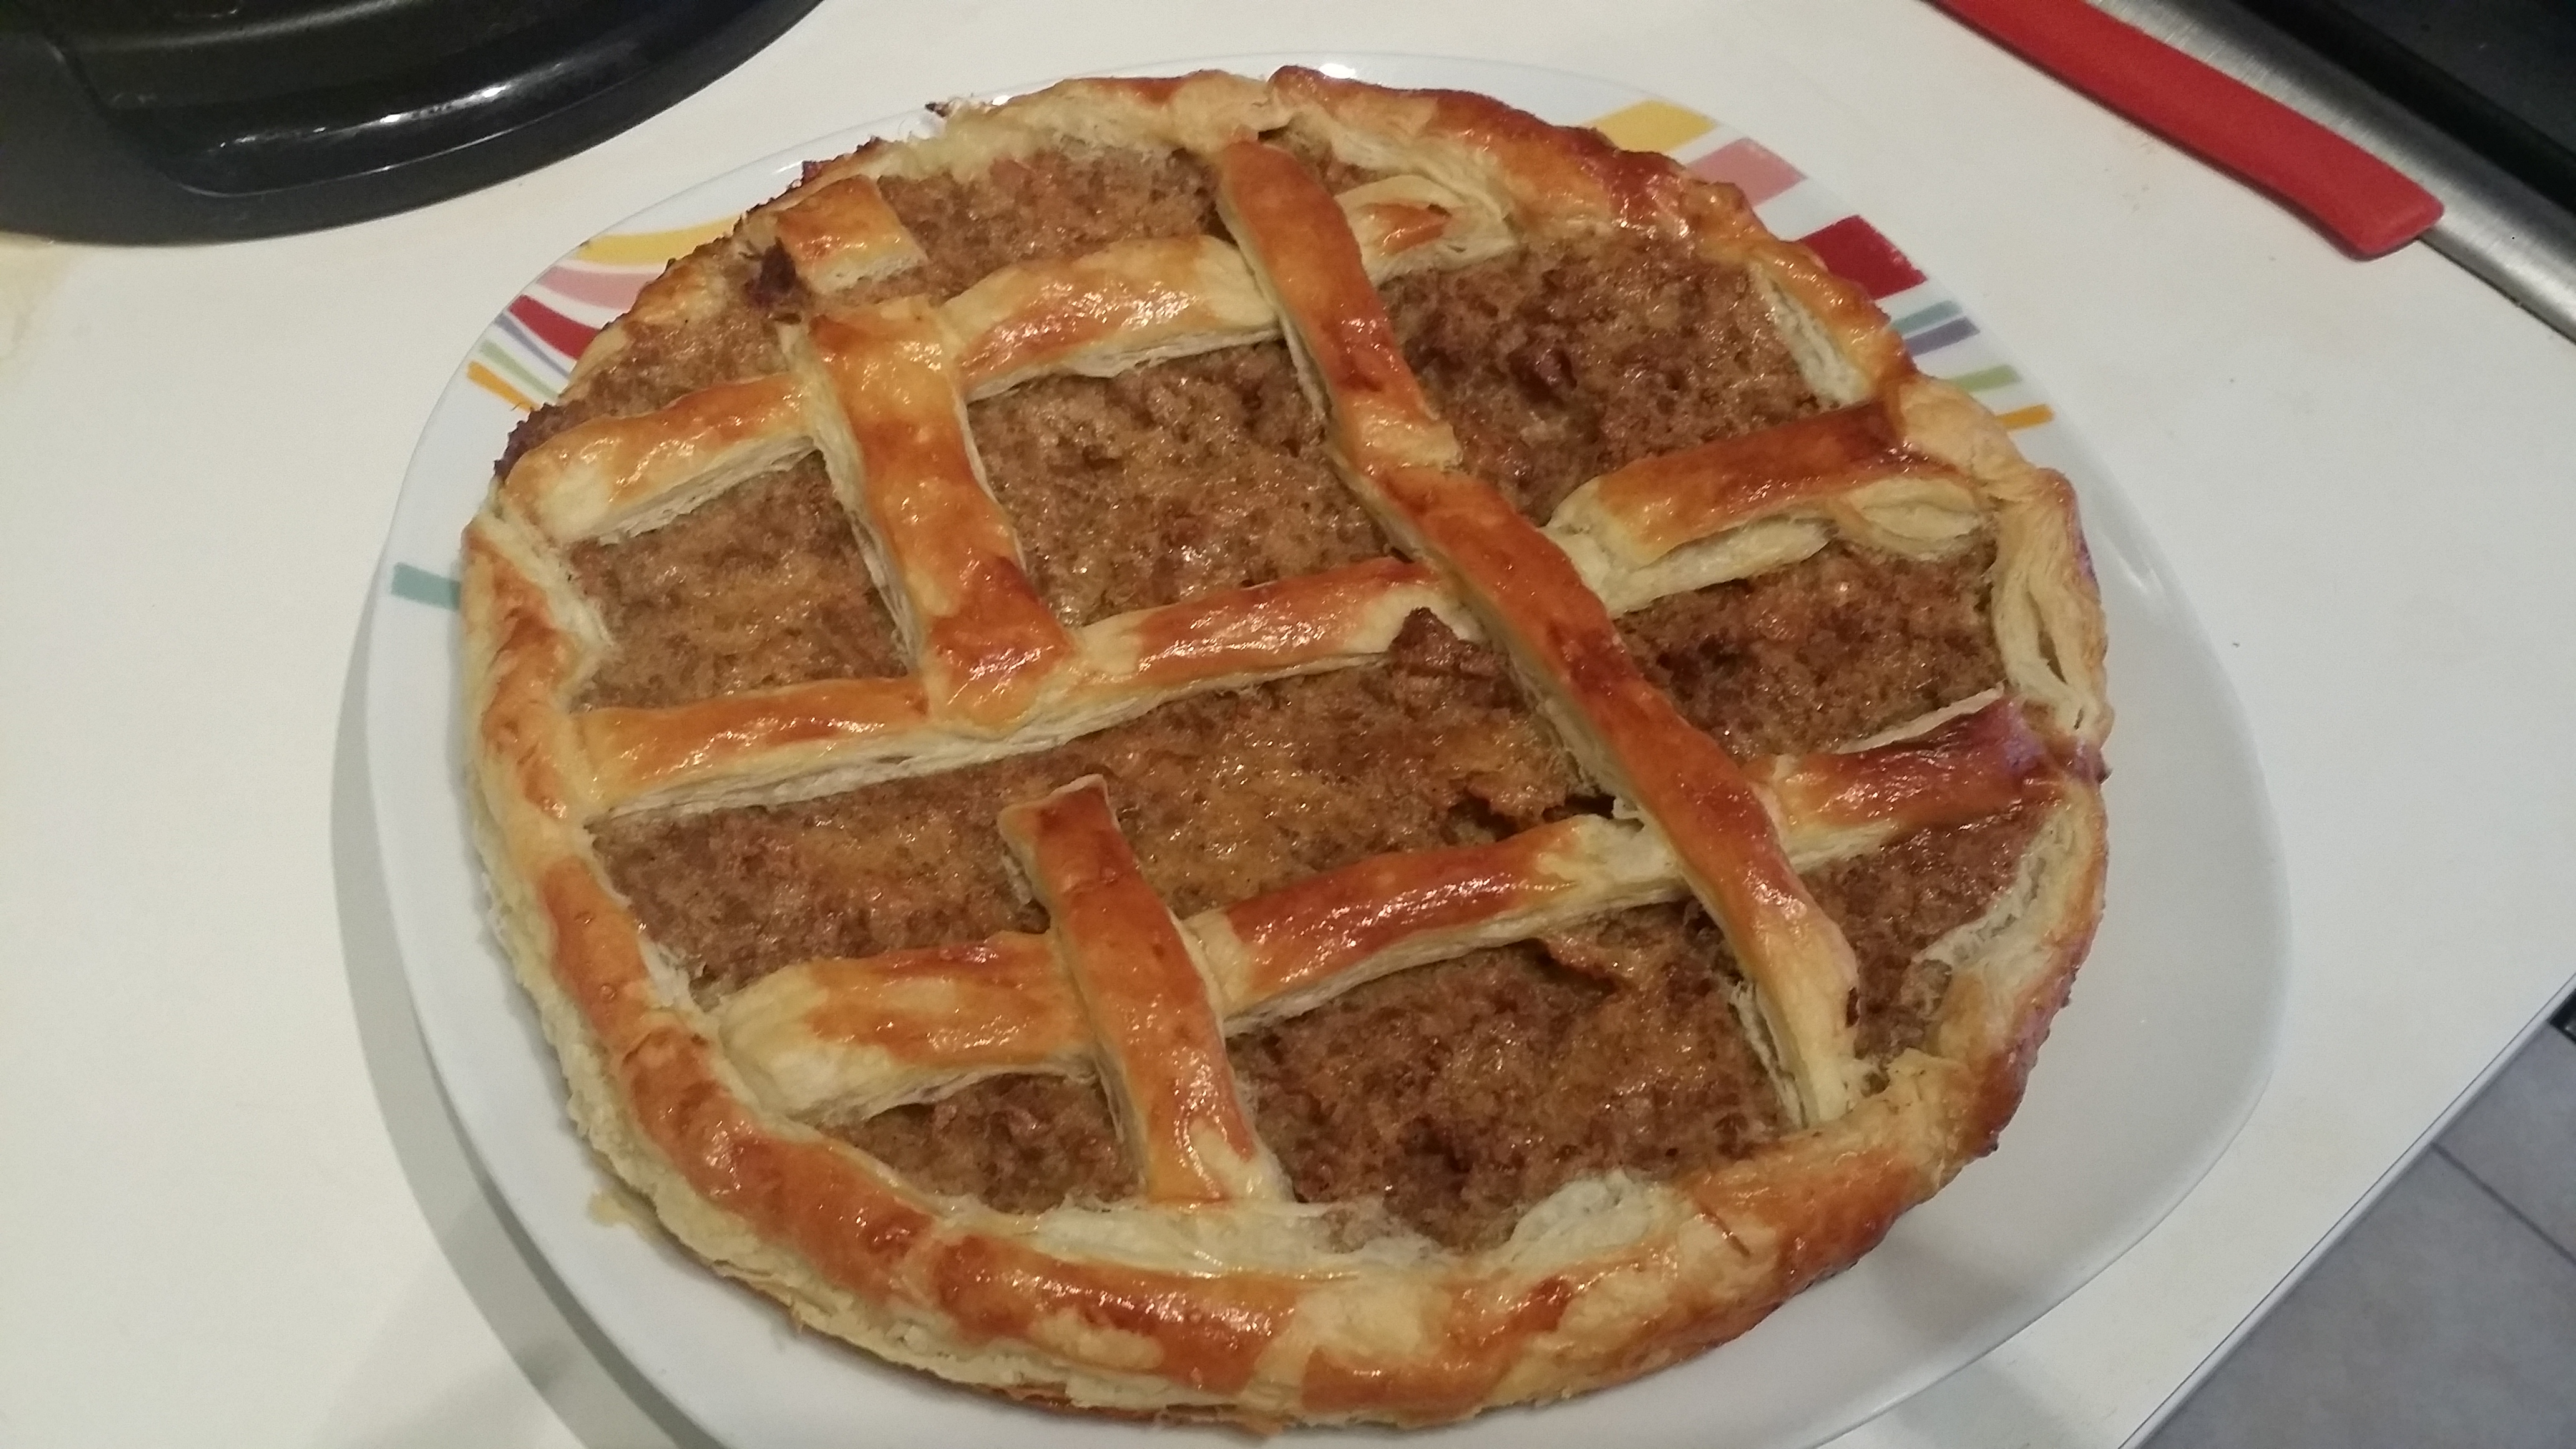 Favoloso Ricette kCook: Torta salata con carne macinata | Blog di kCookItalia RS33